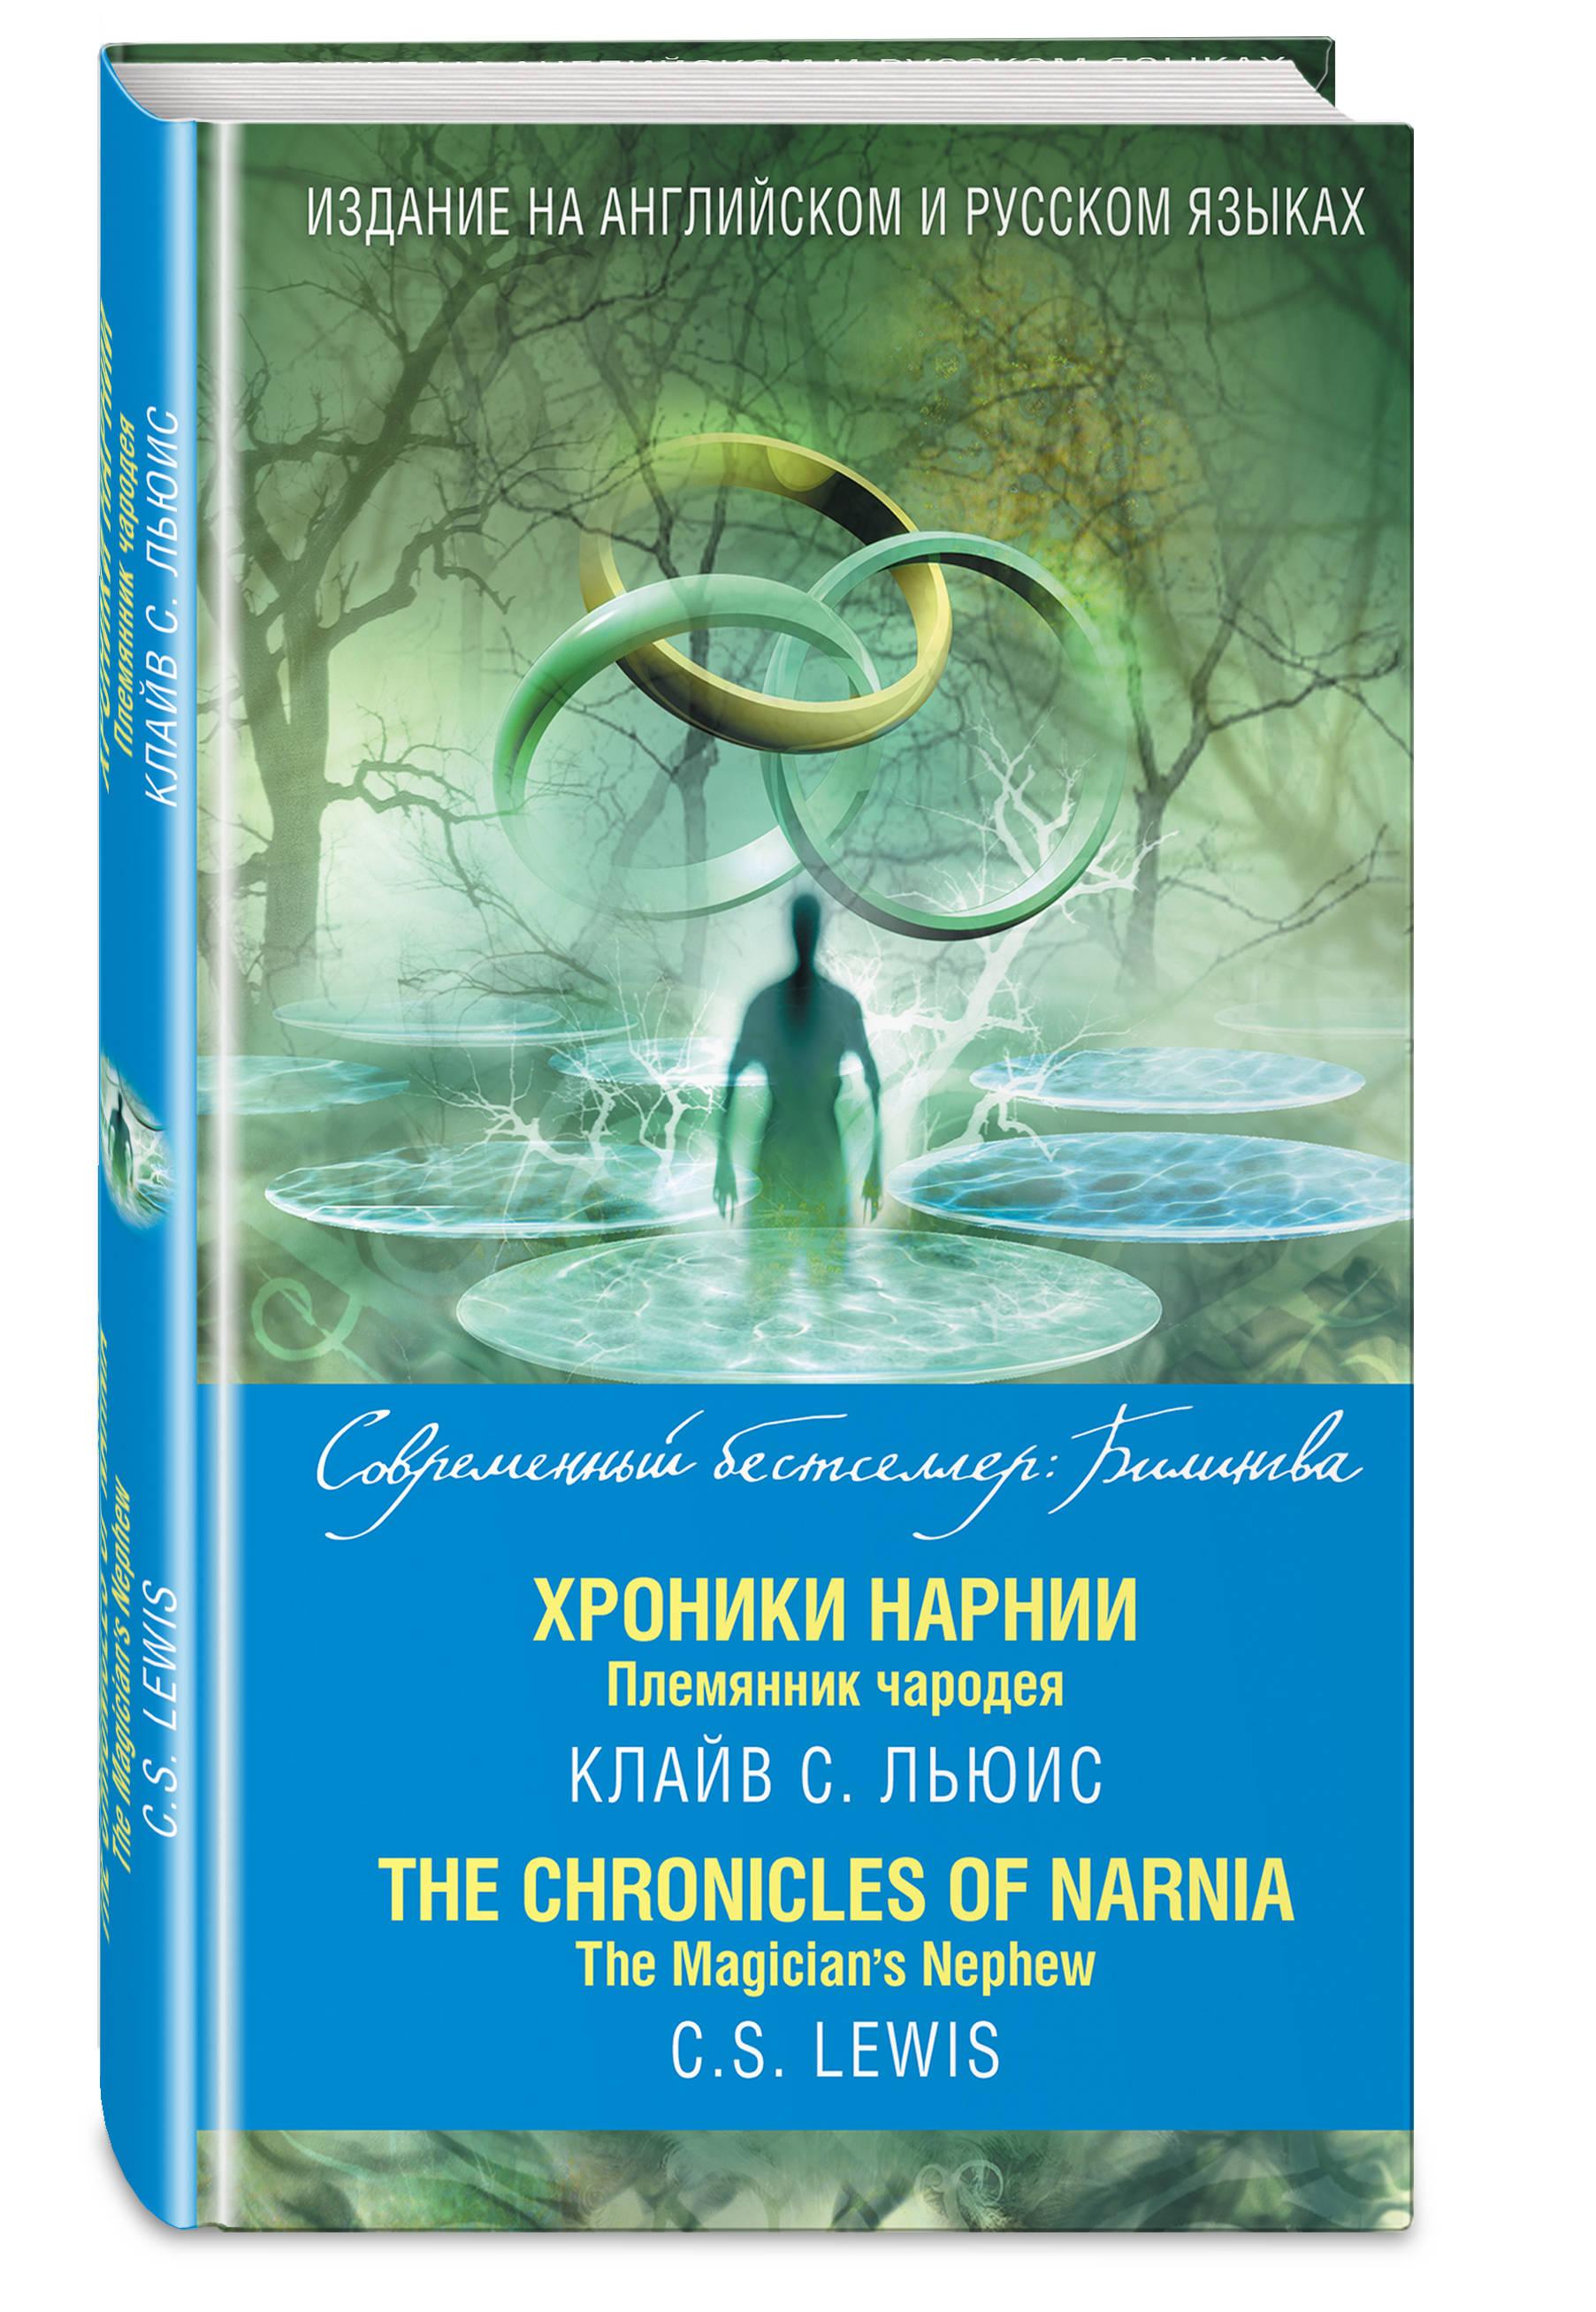 Хроники Нарнии. Племянник чародея = The Chronicles of Narnia. The Magician's Nephew ( Льюис К.  )